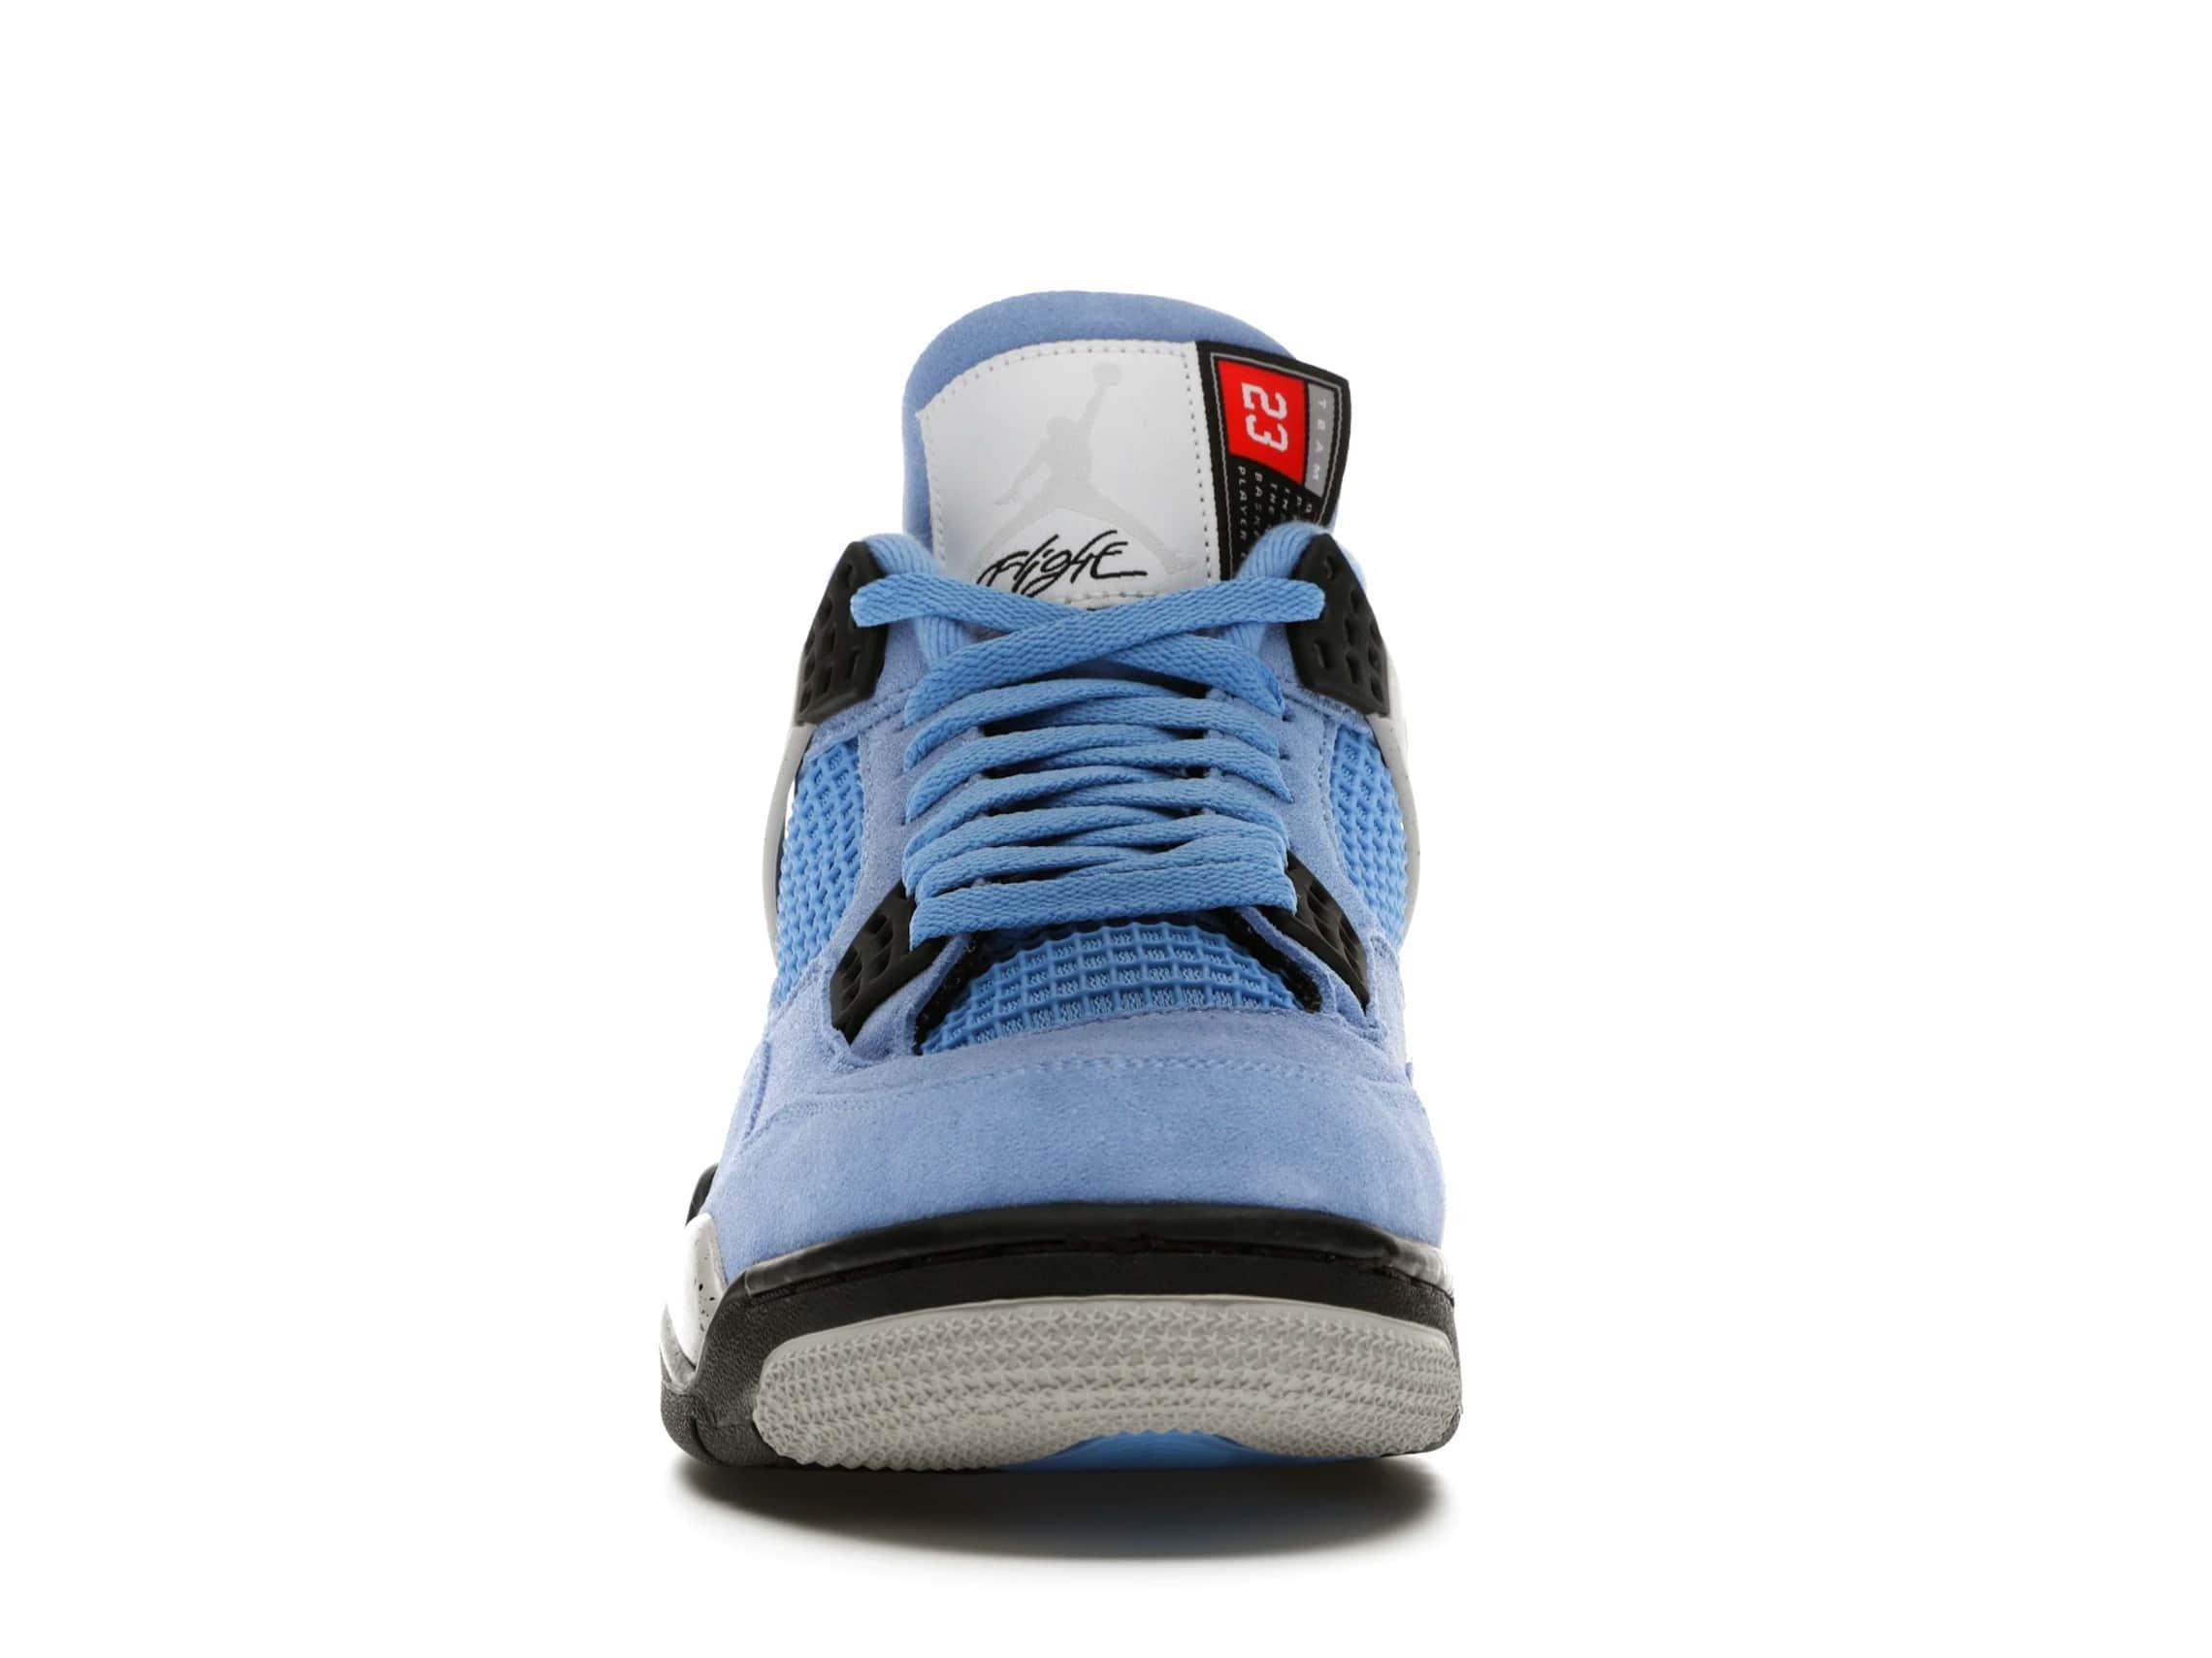 slide 2 - Jordan 4 Retro University Blue